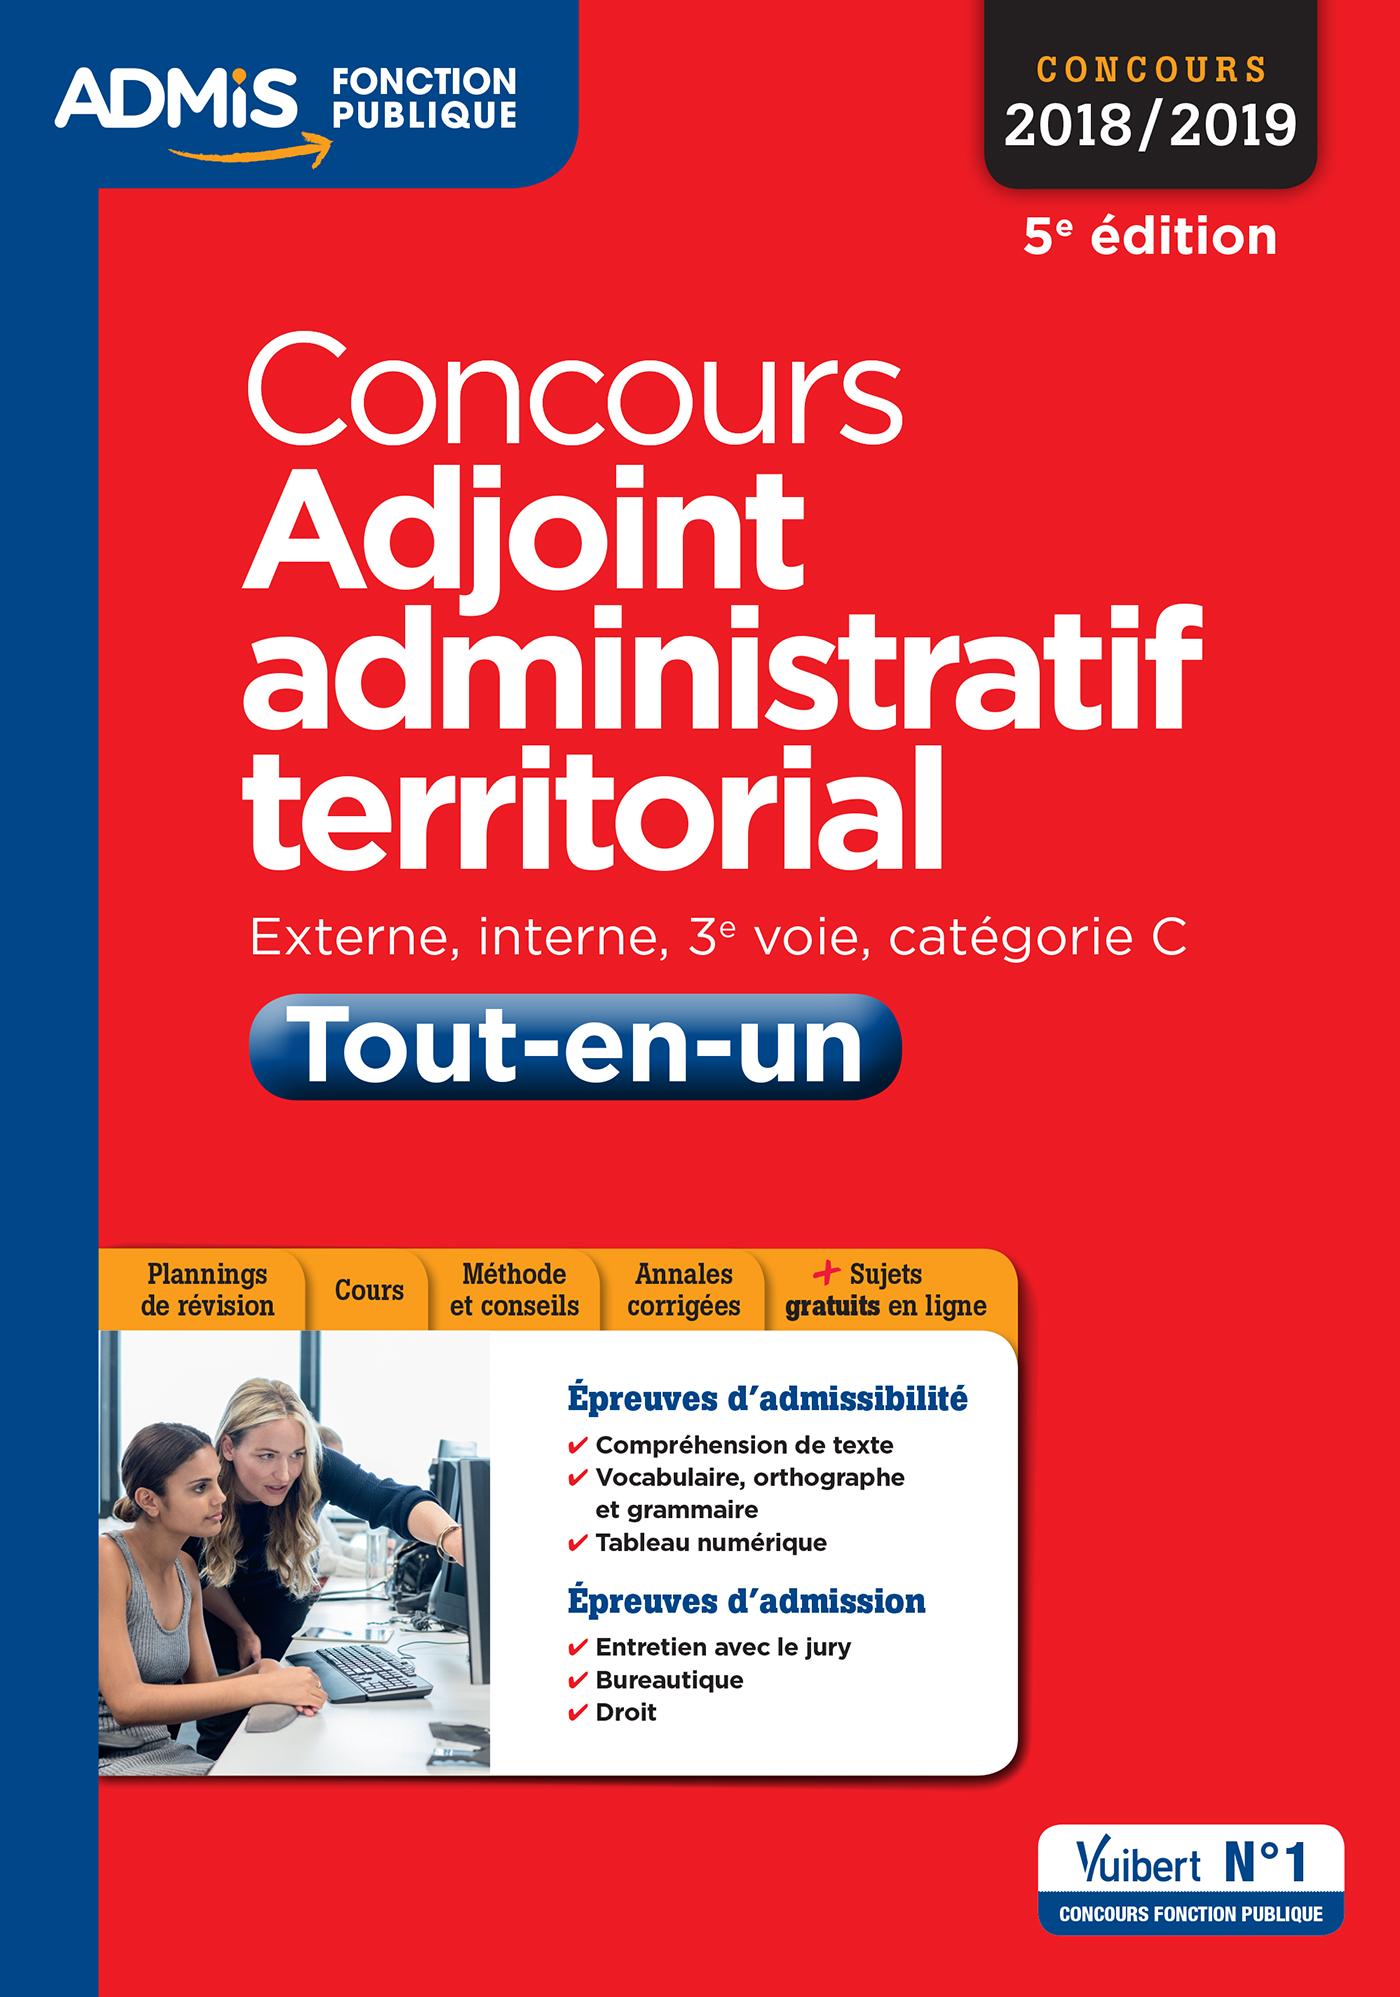 fd2faa59595 Concours Adjoint administratif territorial - Catégorie C - Tout-en ...